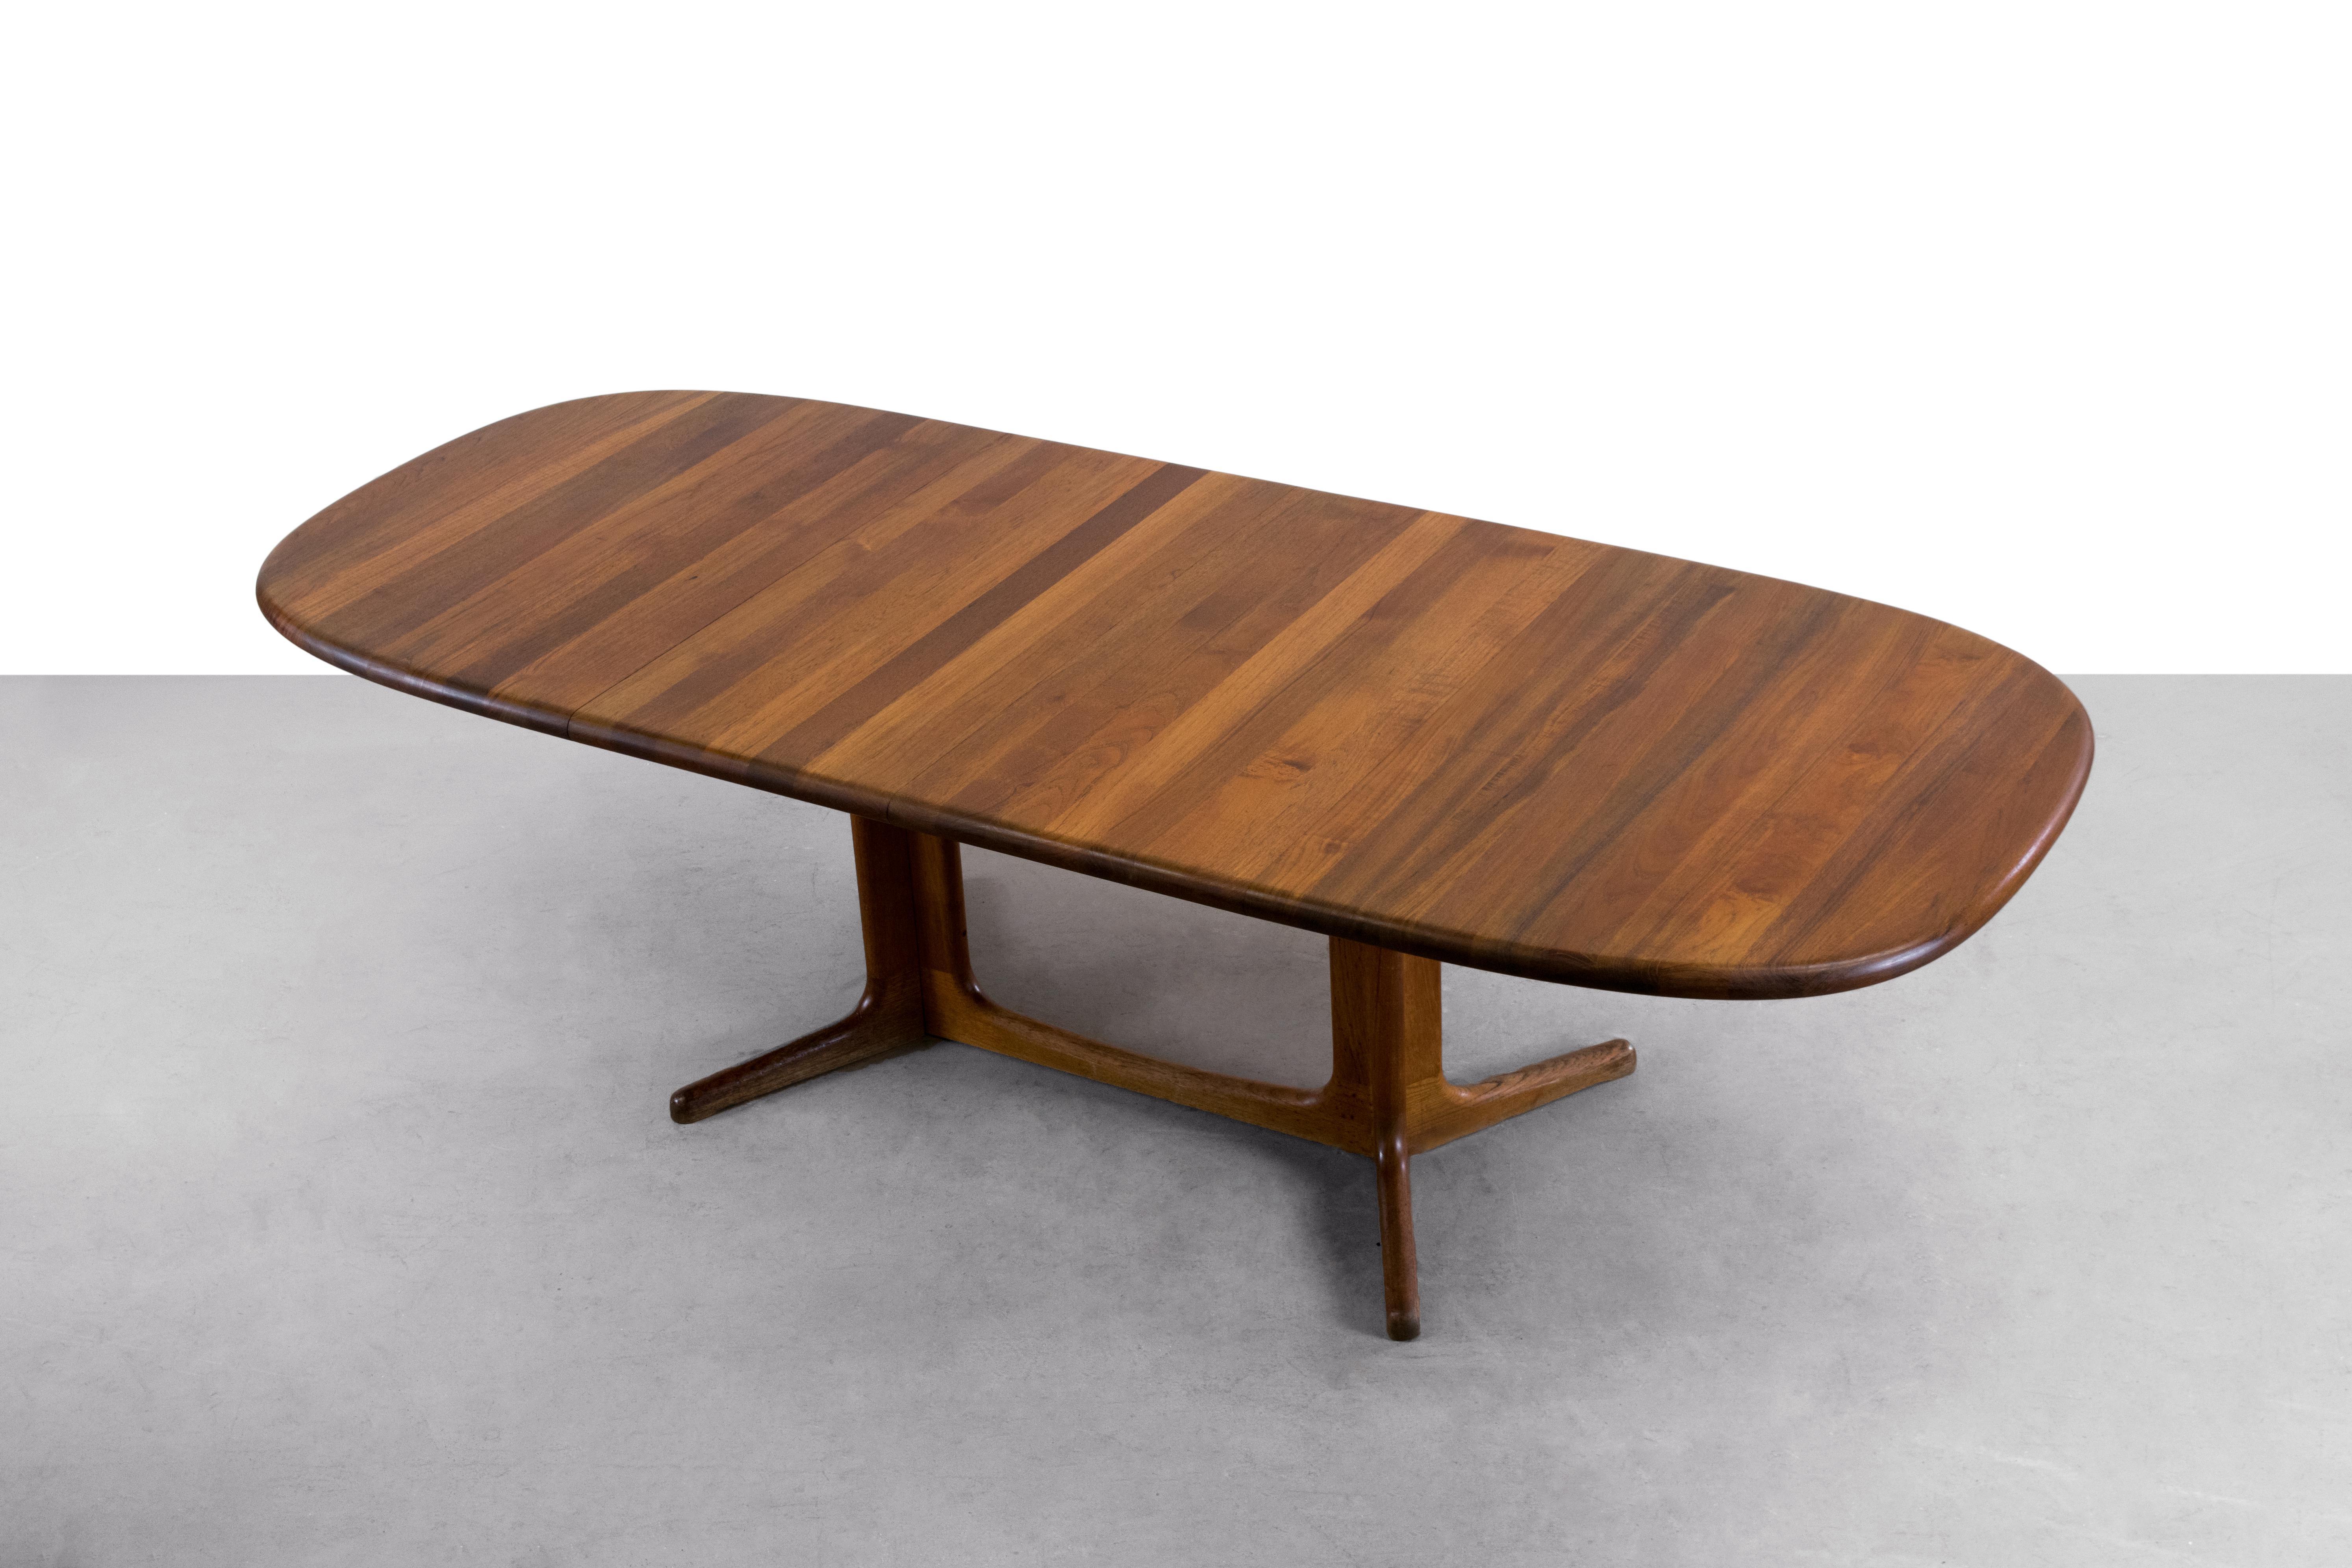 Solid Teak Danish Modern Extension Dining Table Chairish : c7c6fff8 2306 48e2 bf32 f92f84a56673aspectfitampwidth640ampheight640 from www.chairish.com size 640 x 640 jpeg 24kB